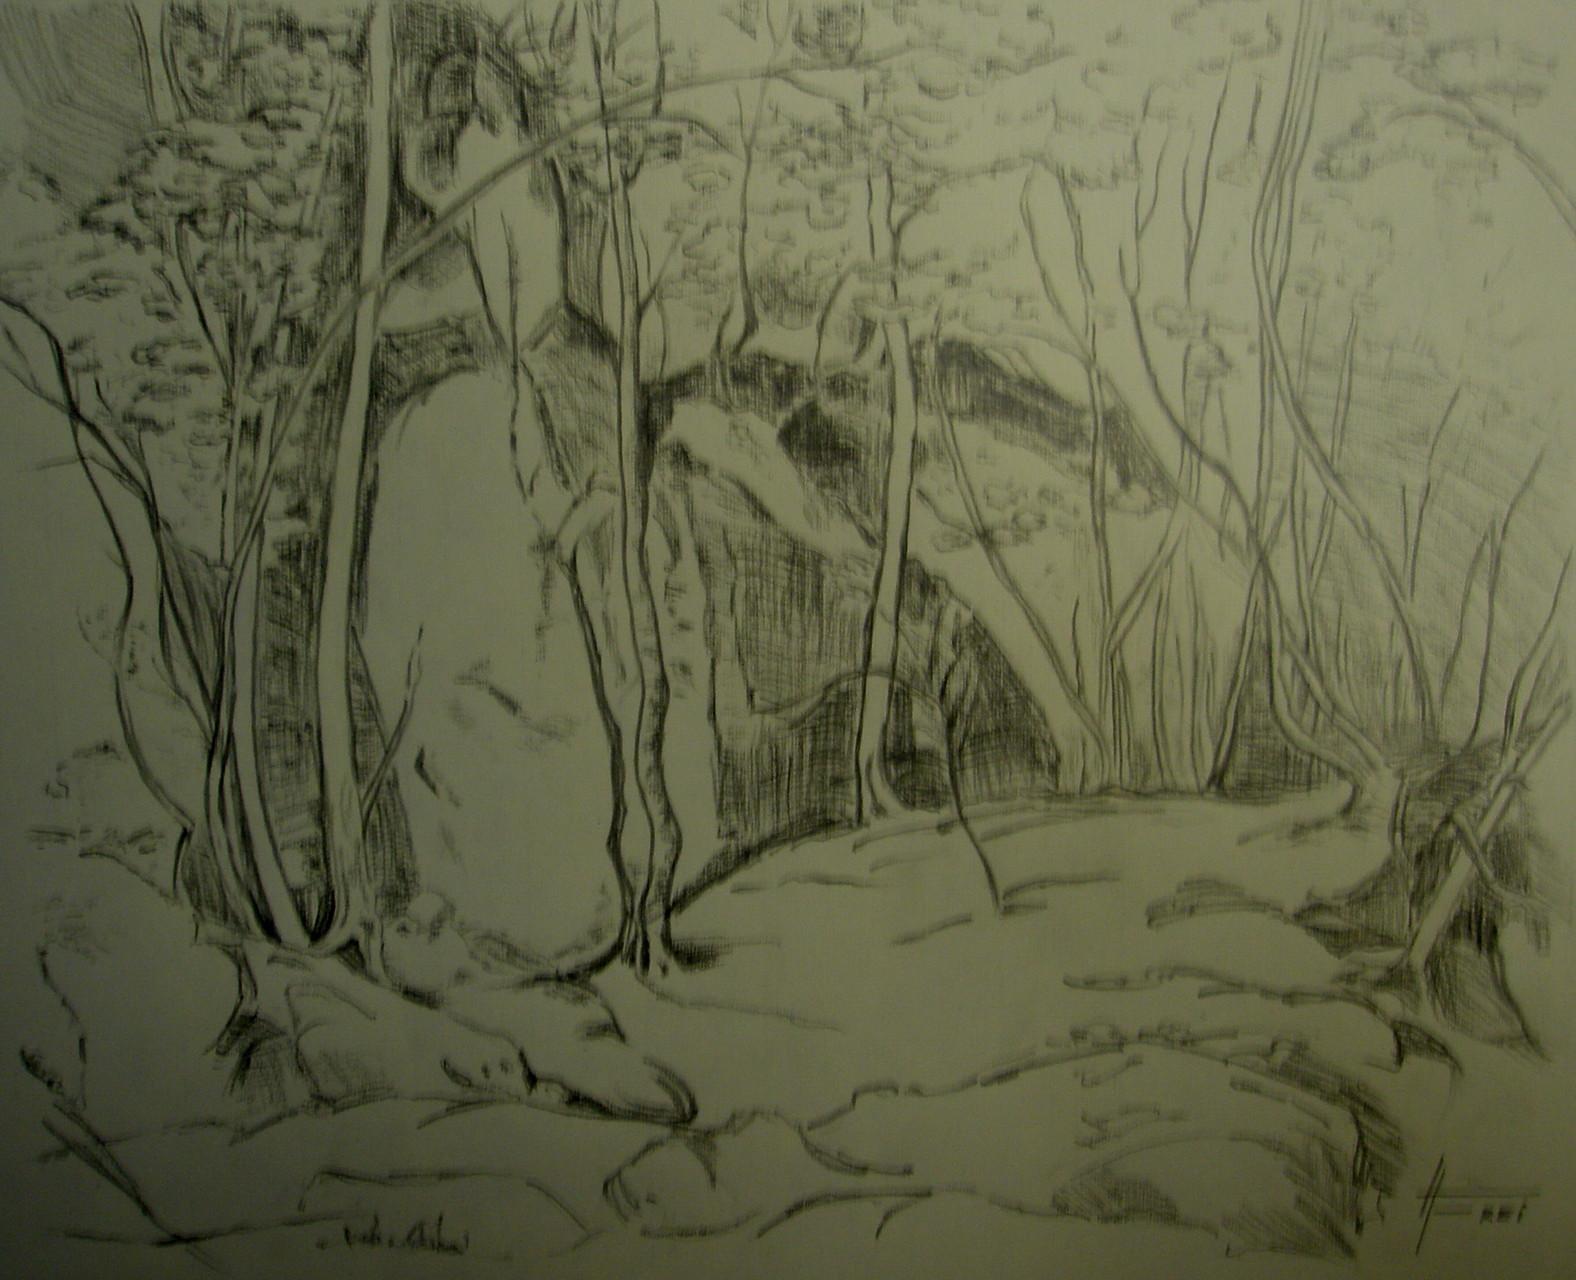 """Wald-Felsen-Studie""- Bleistift - 2007"